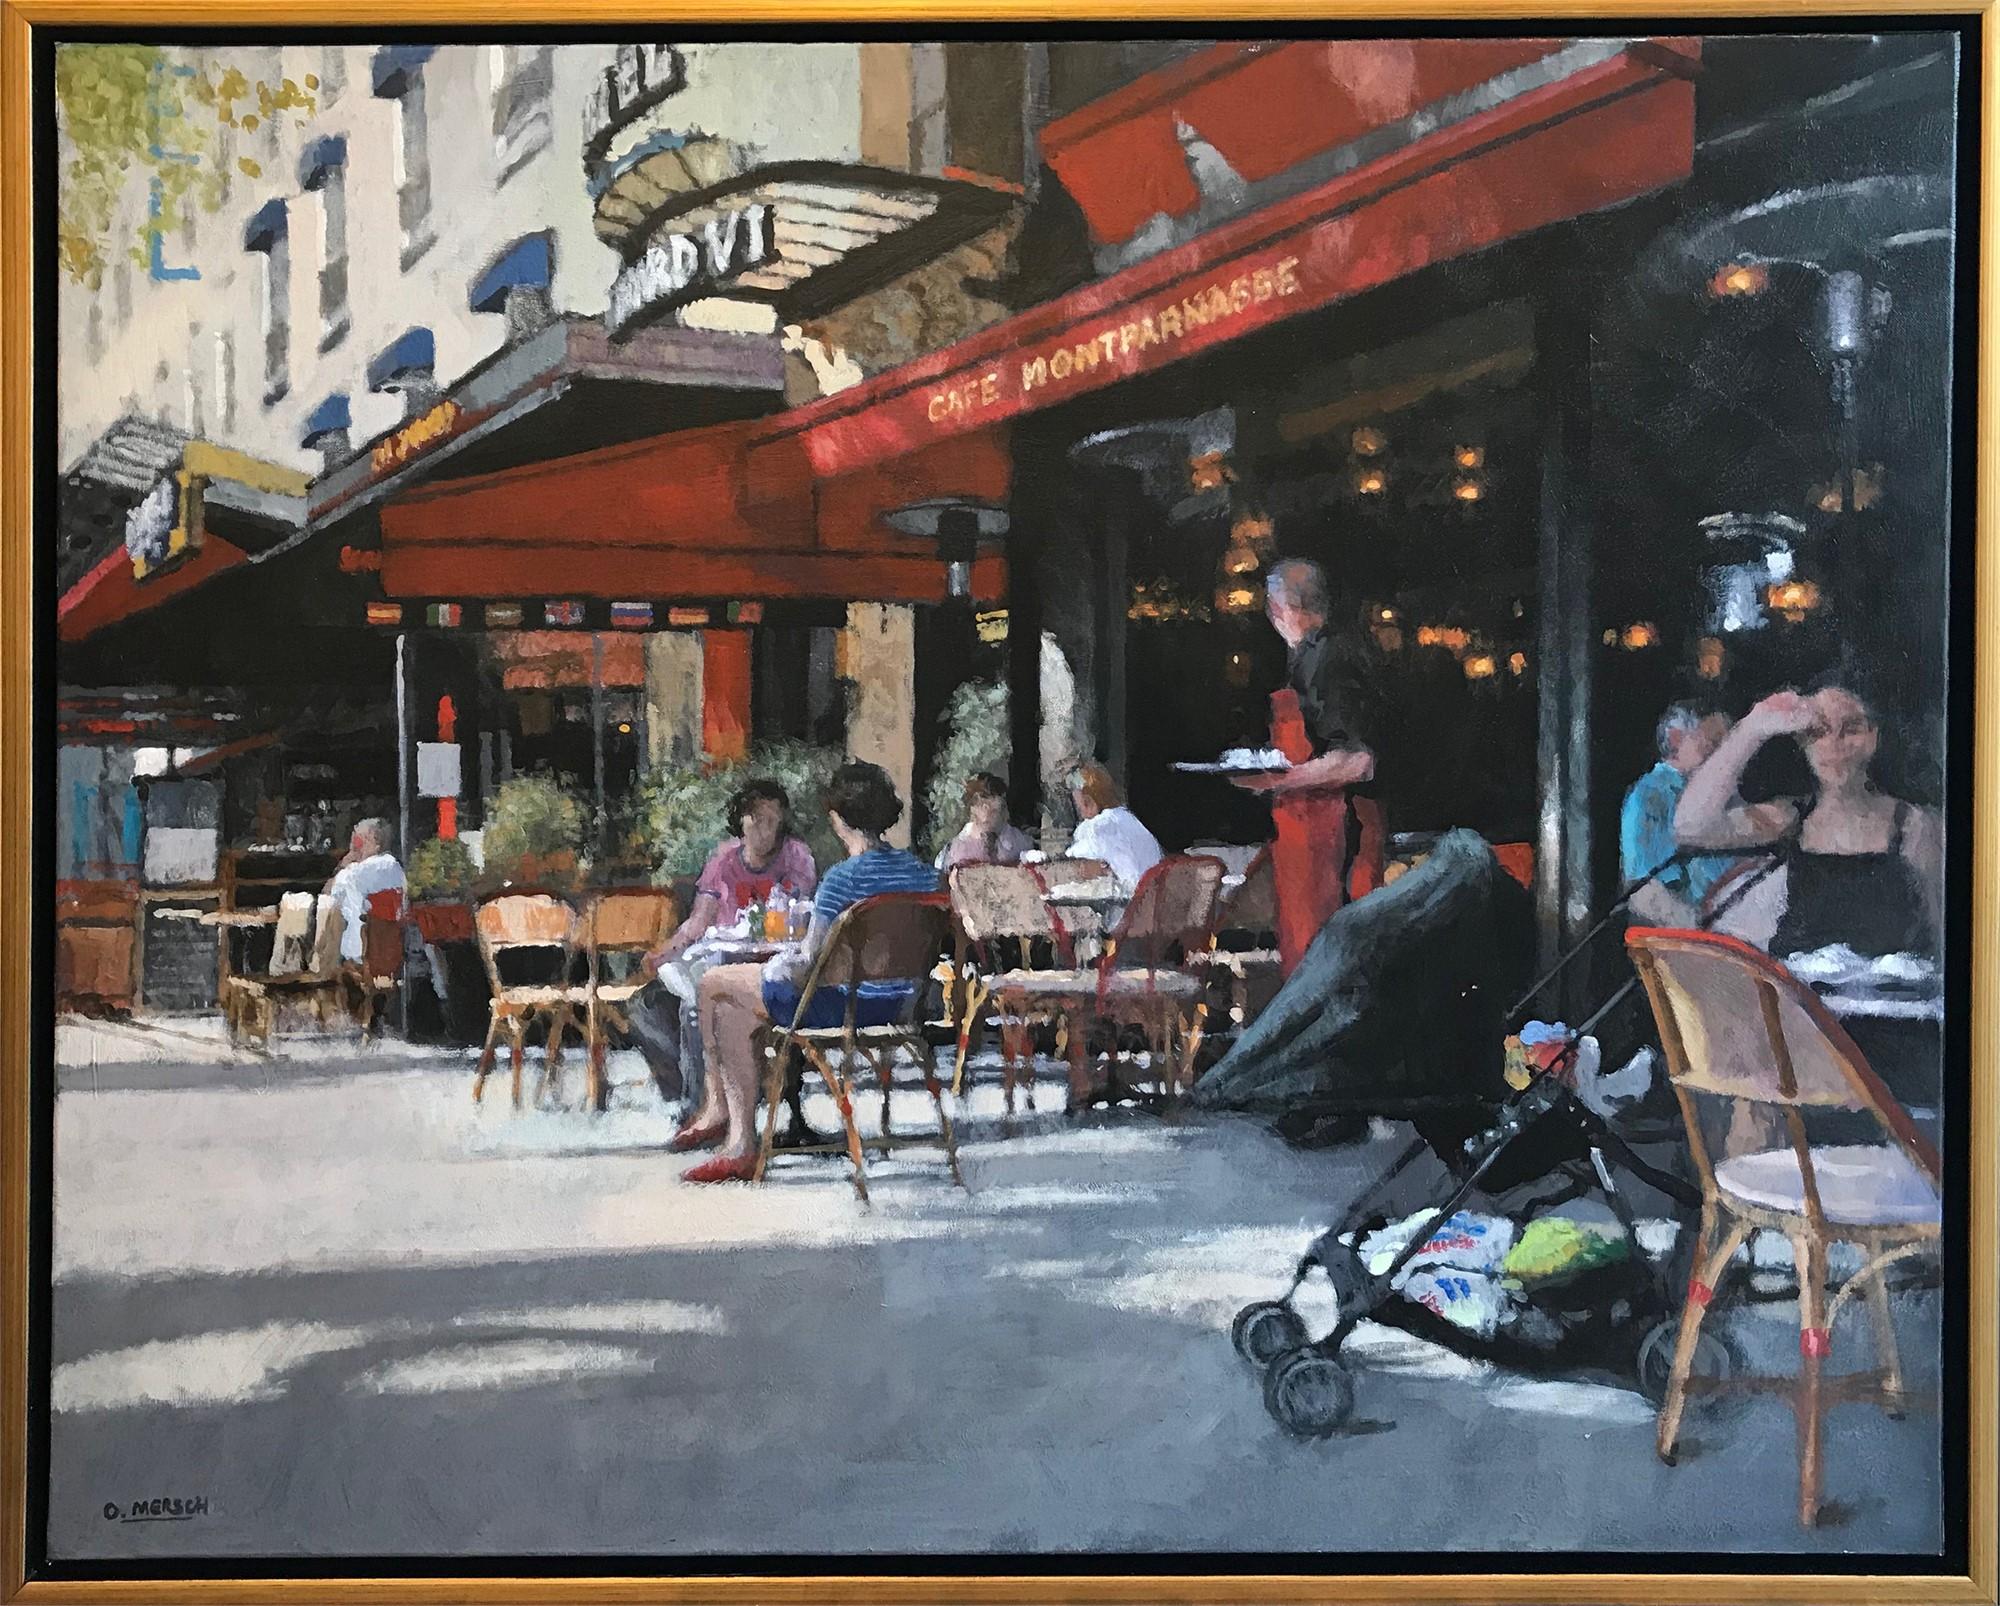 Sidewalk Cafe in Paris by Oscar Mersch